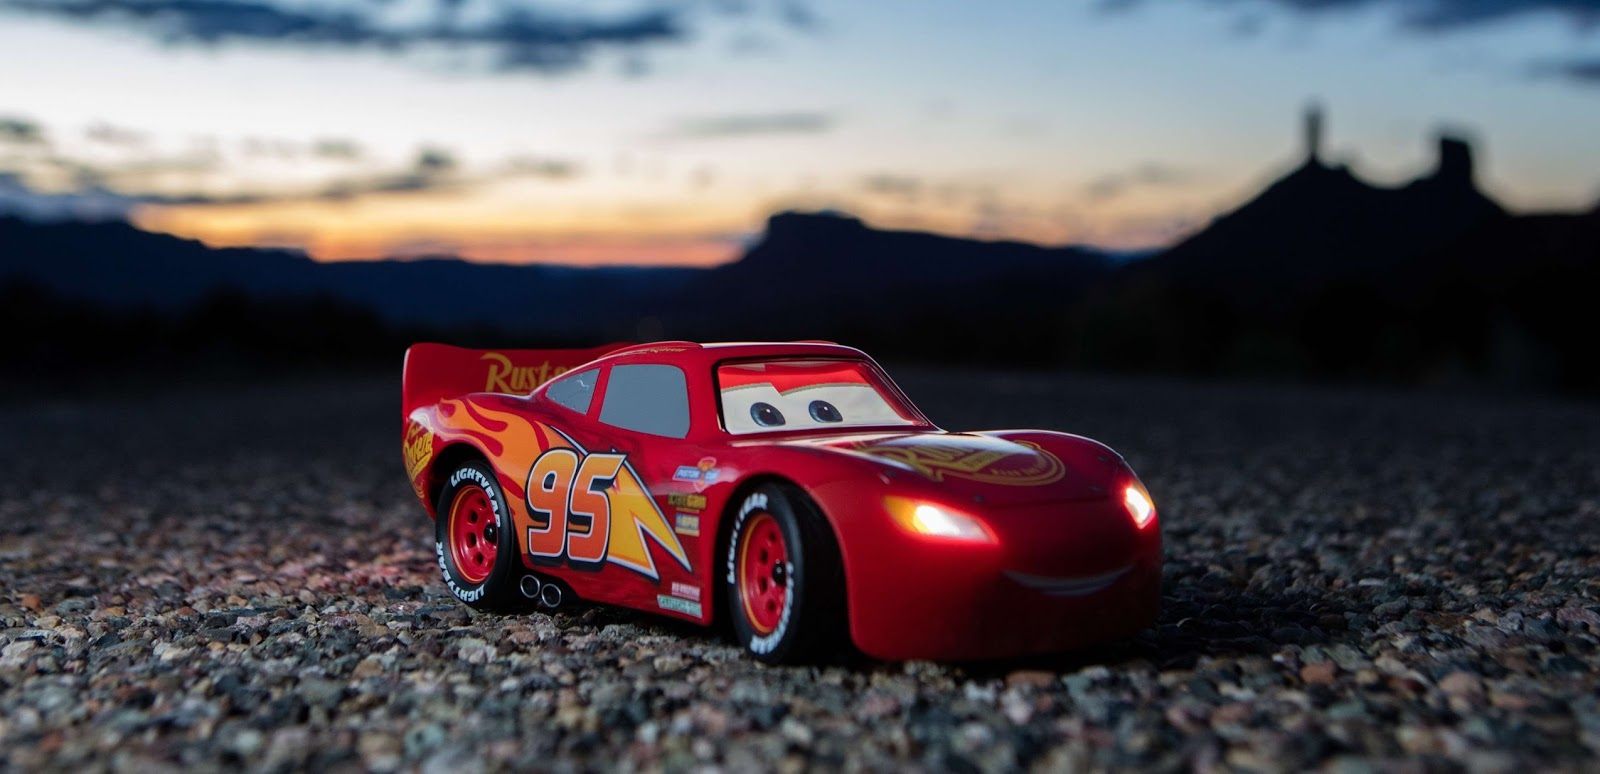 Ultimate Lightning Mcqueen Disney Cars